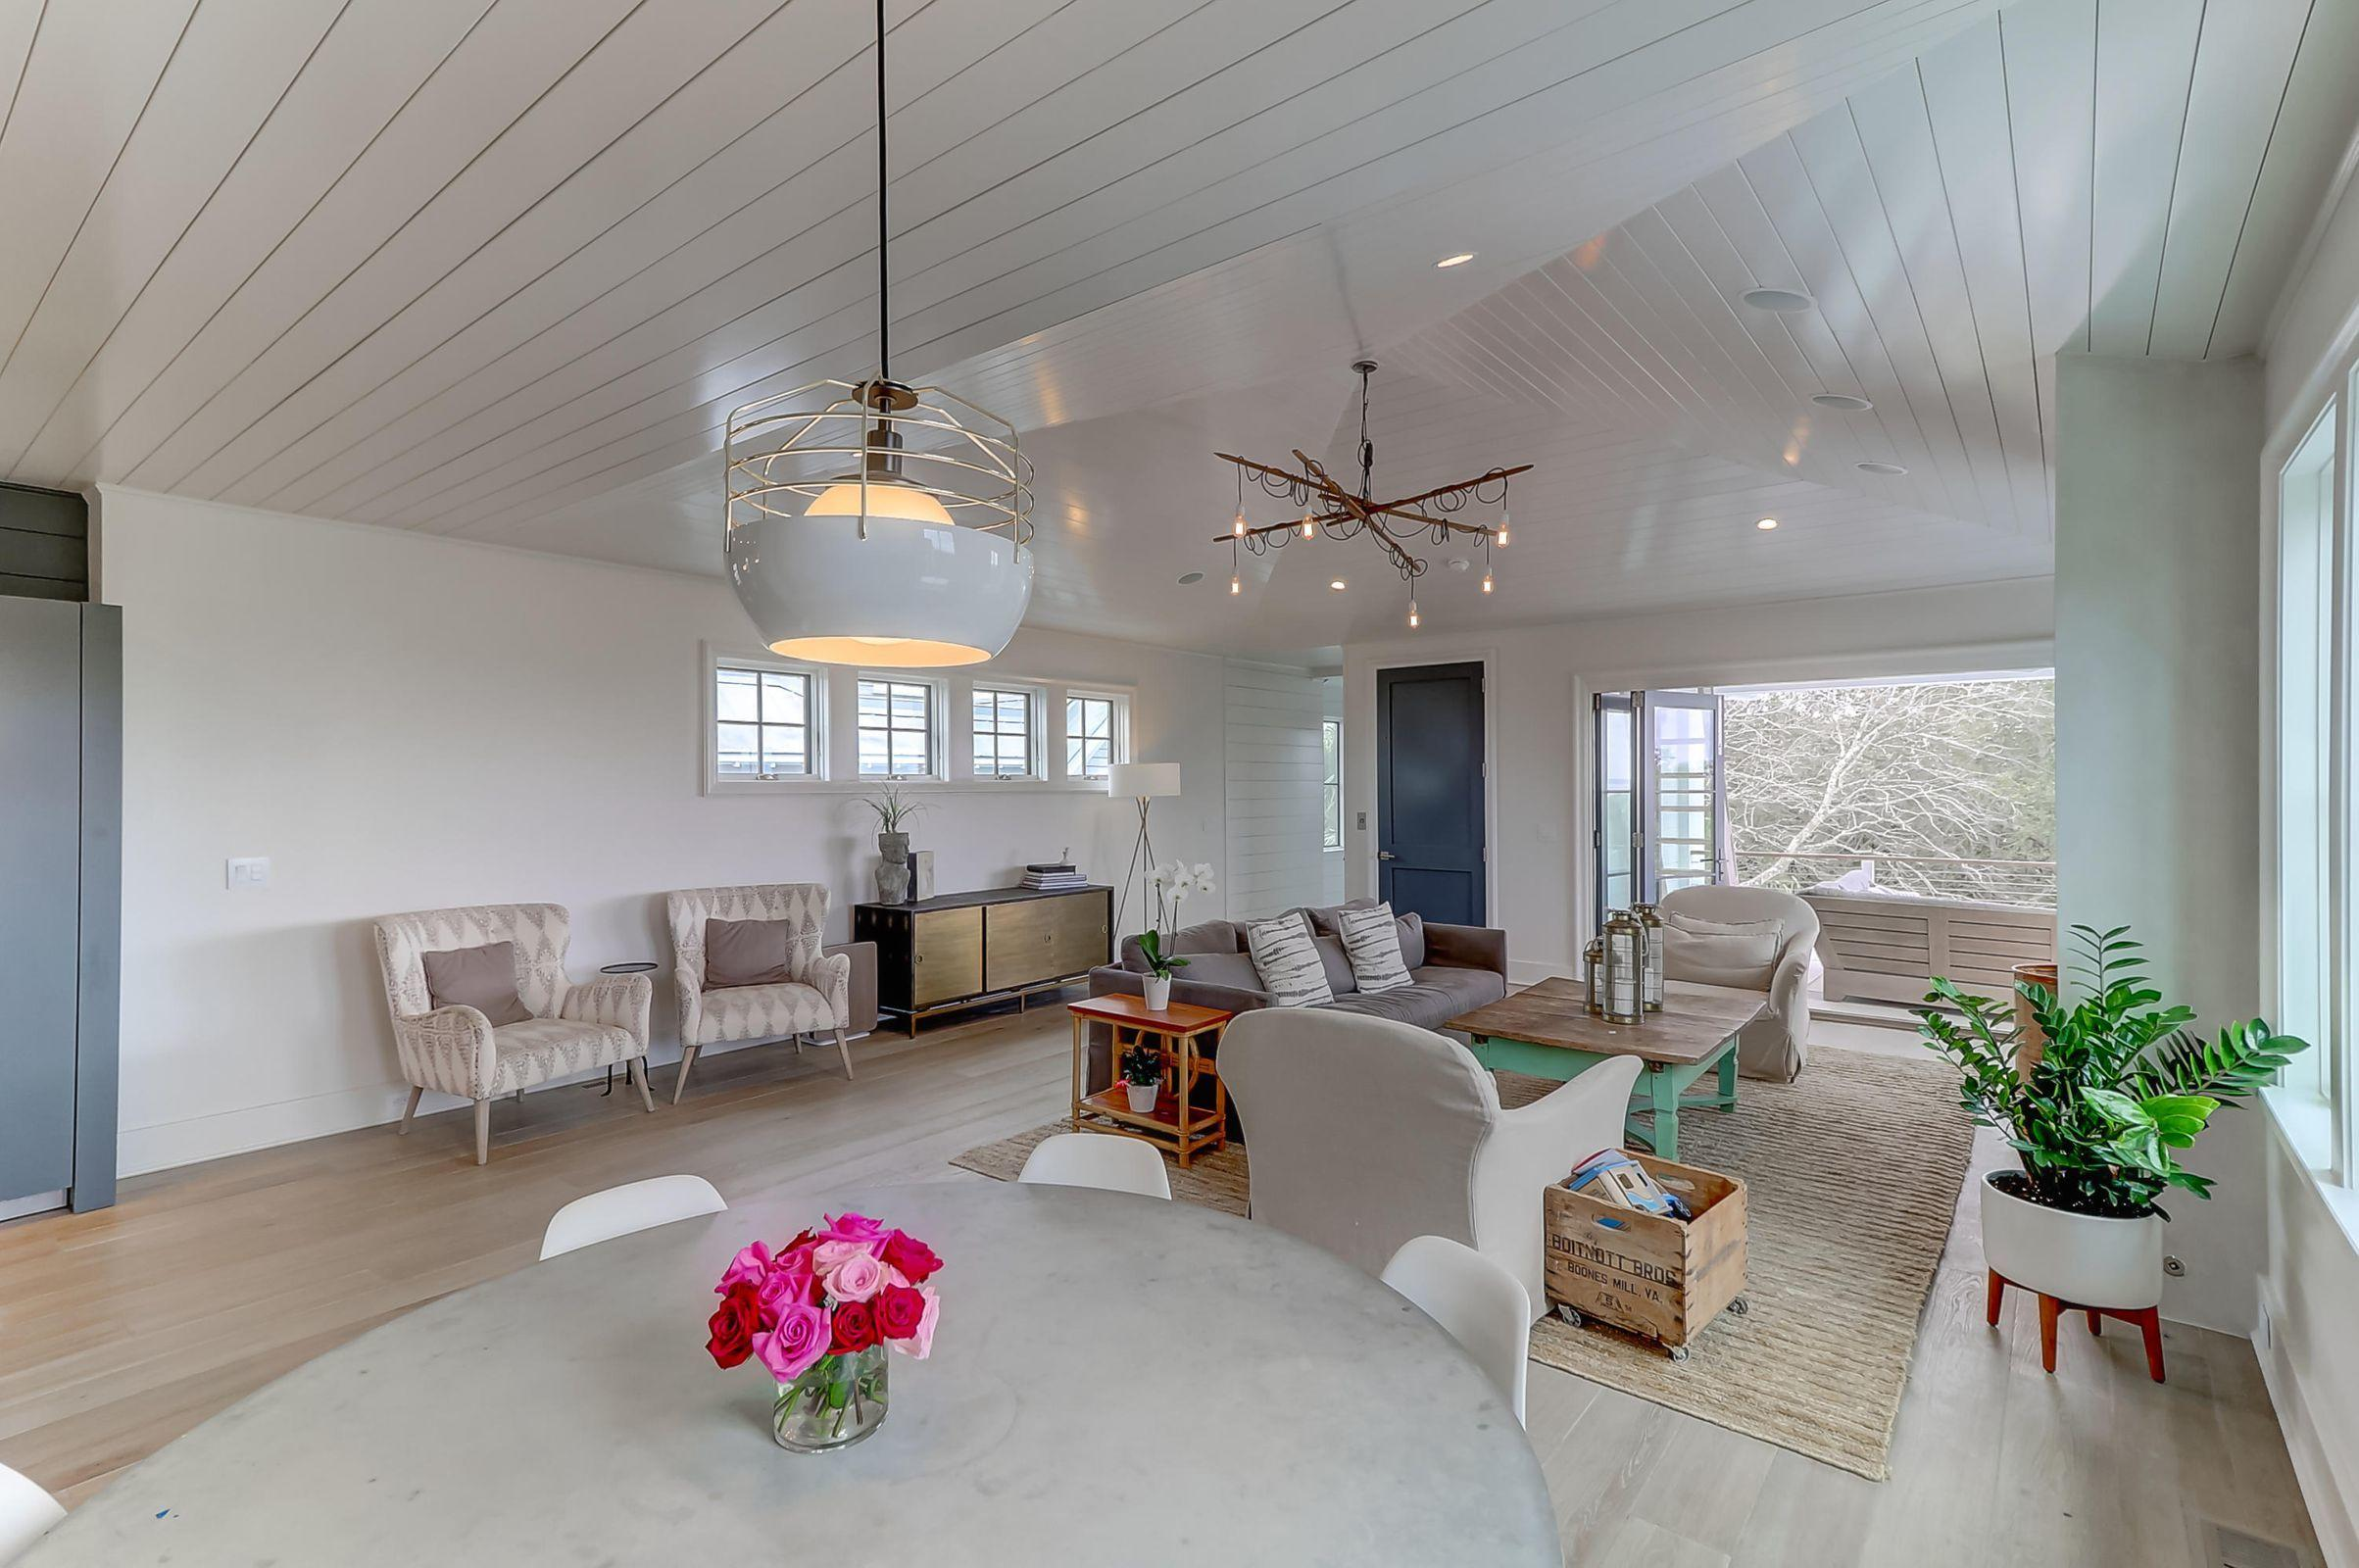 Sullivans Island Homes For Sale - 918 Middle, Sullivans Island, SC - 14